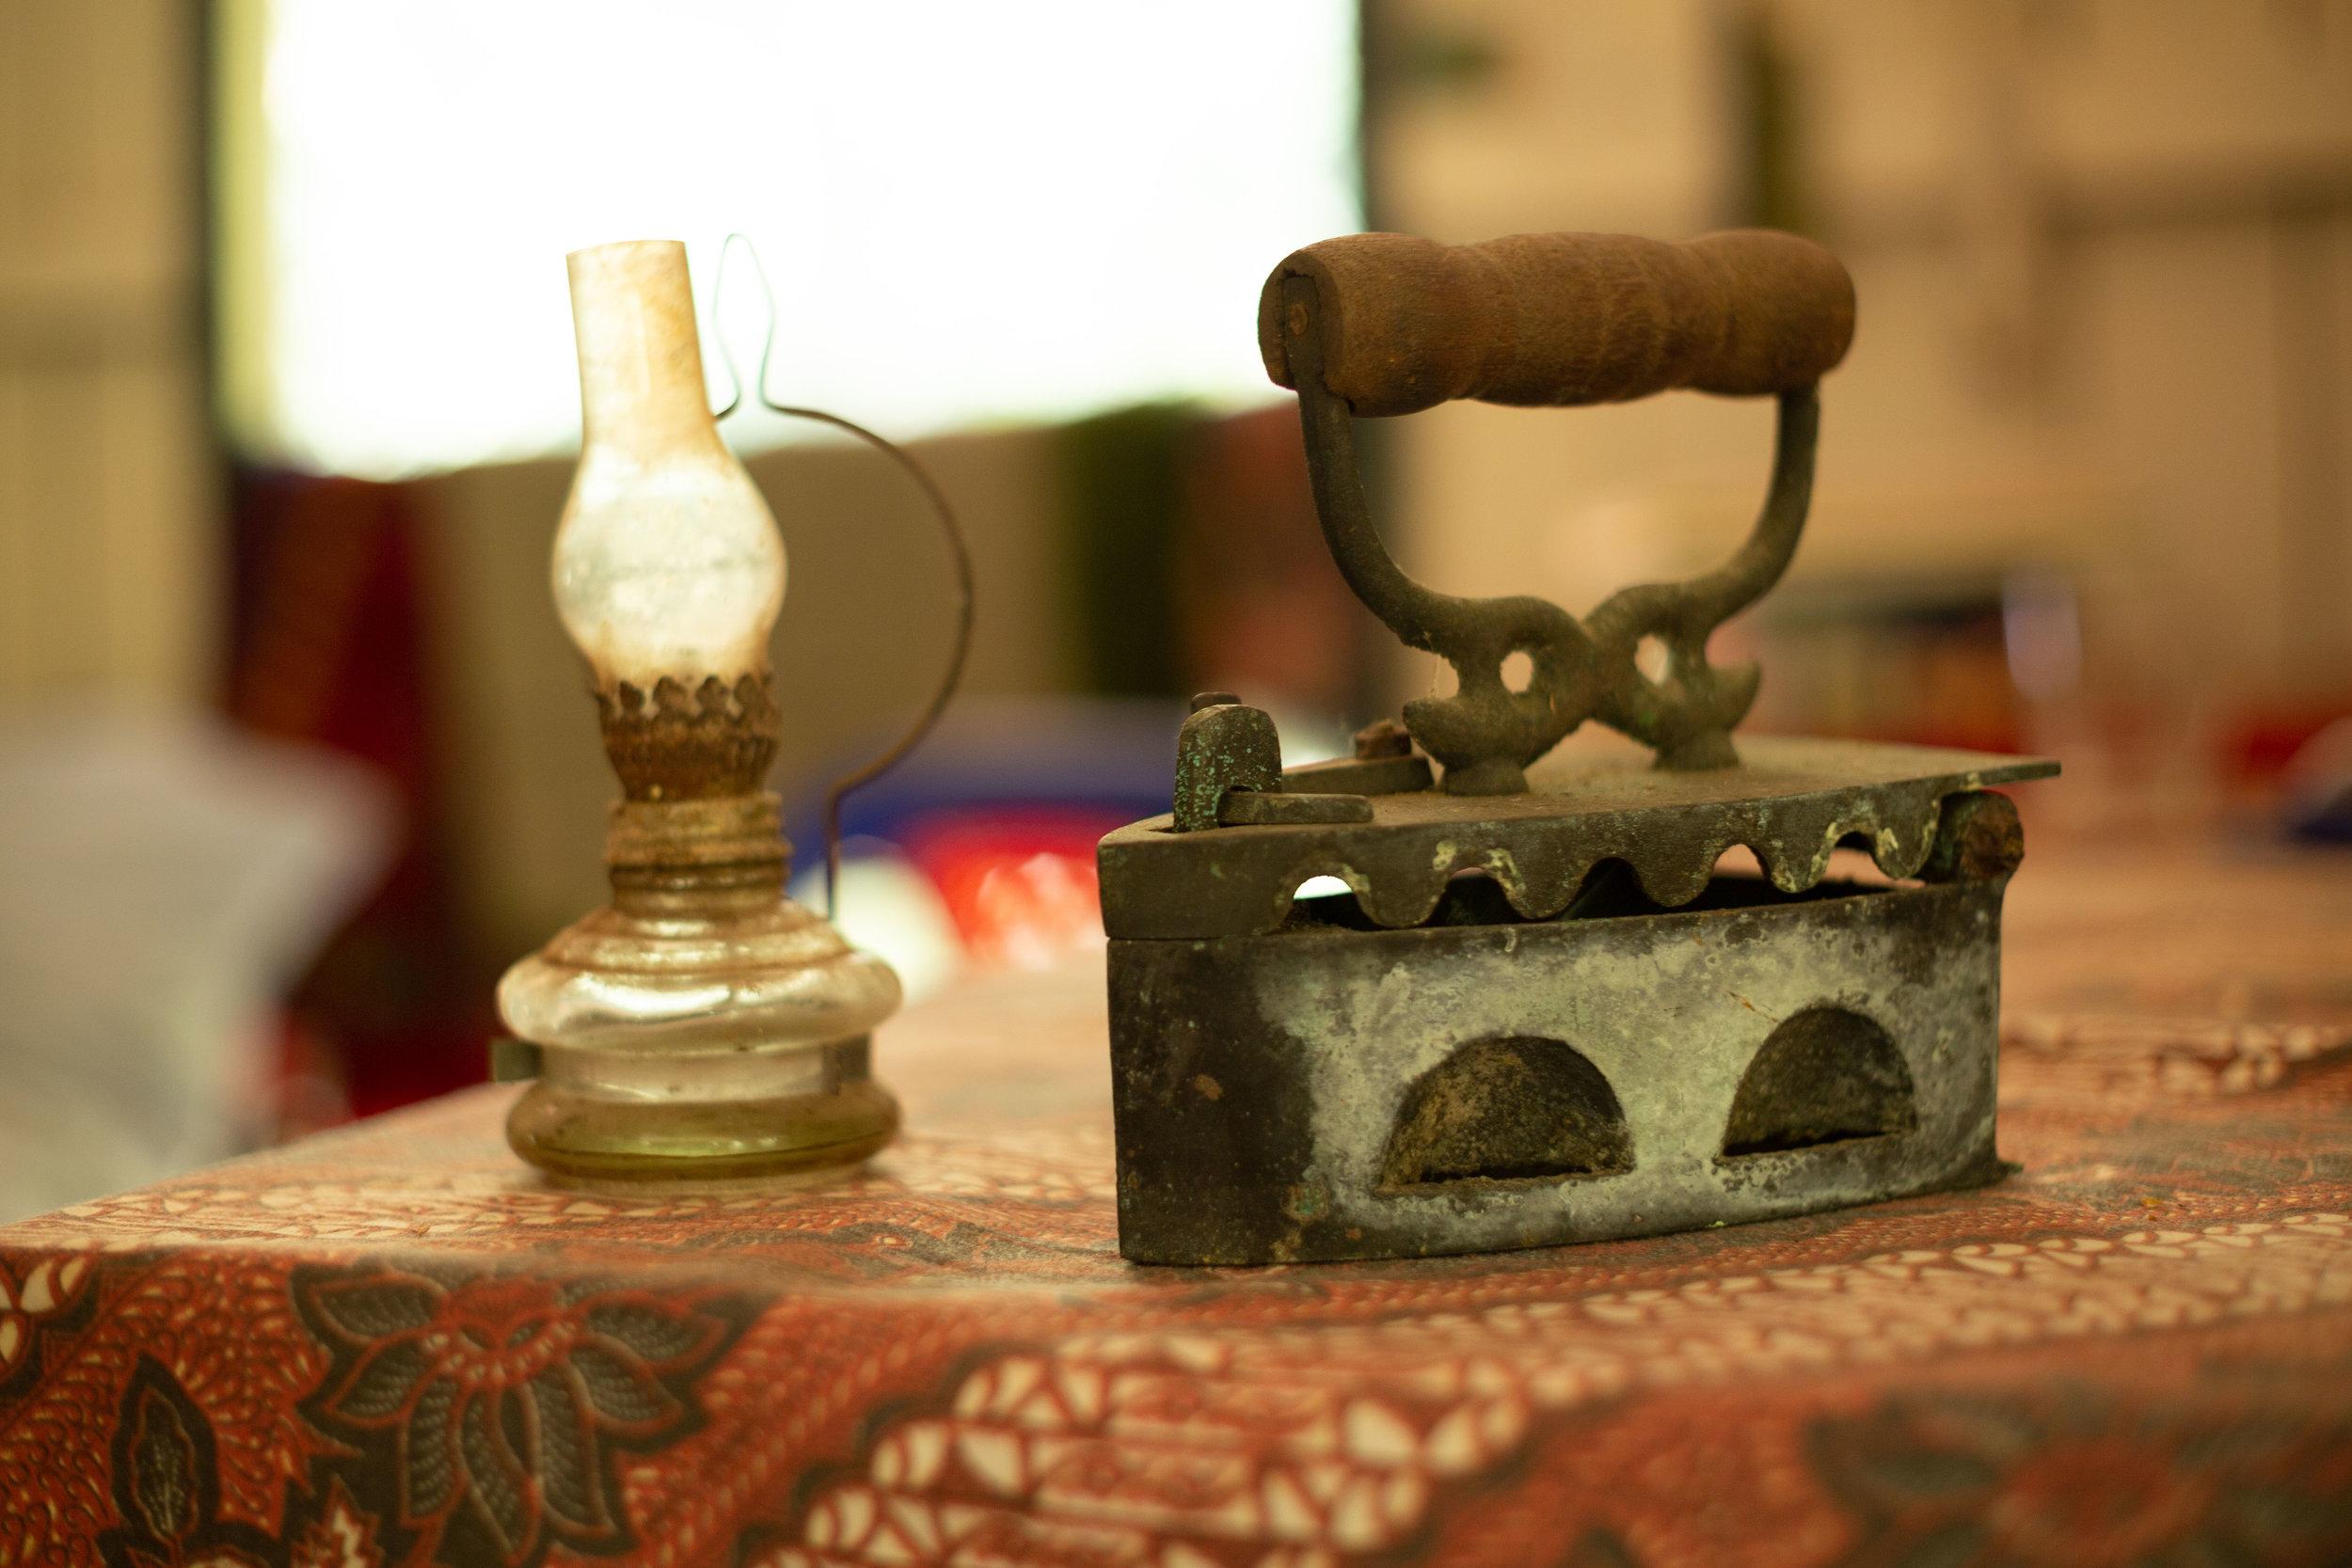 The 19th century kerosene lamp next to a coal-powered ironing device